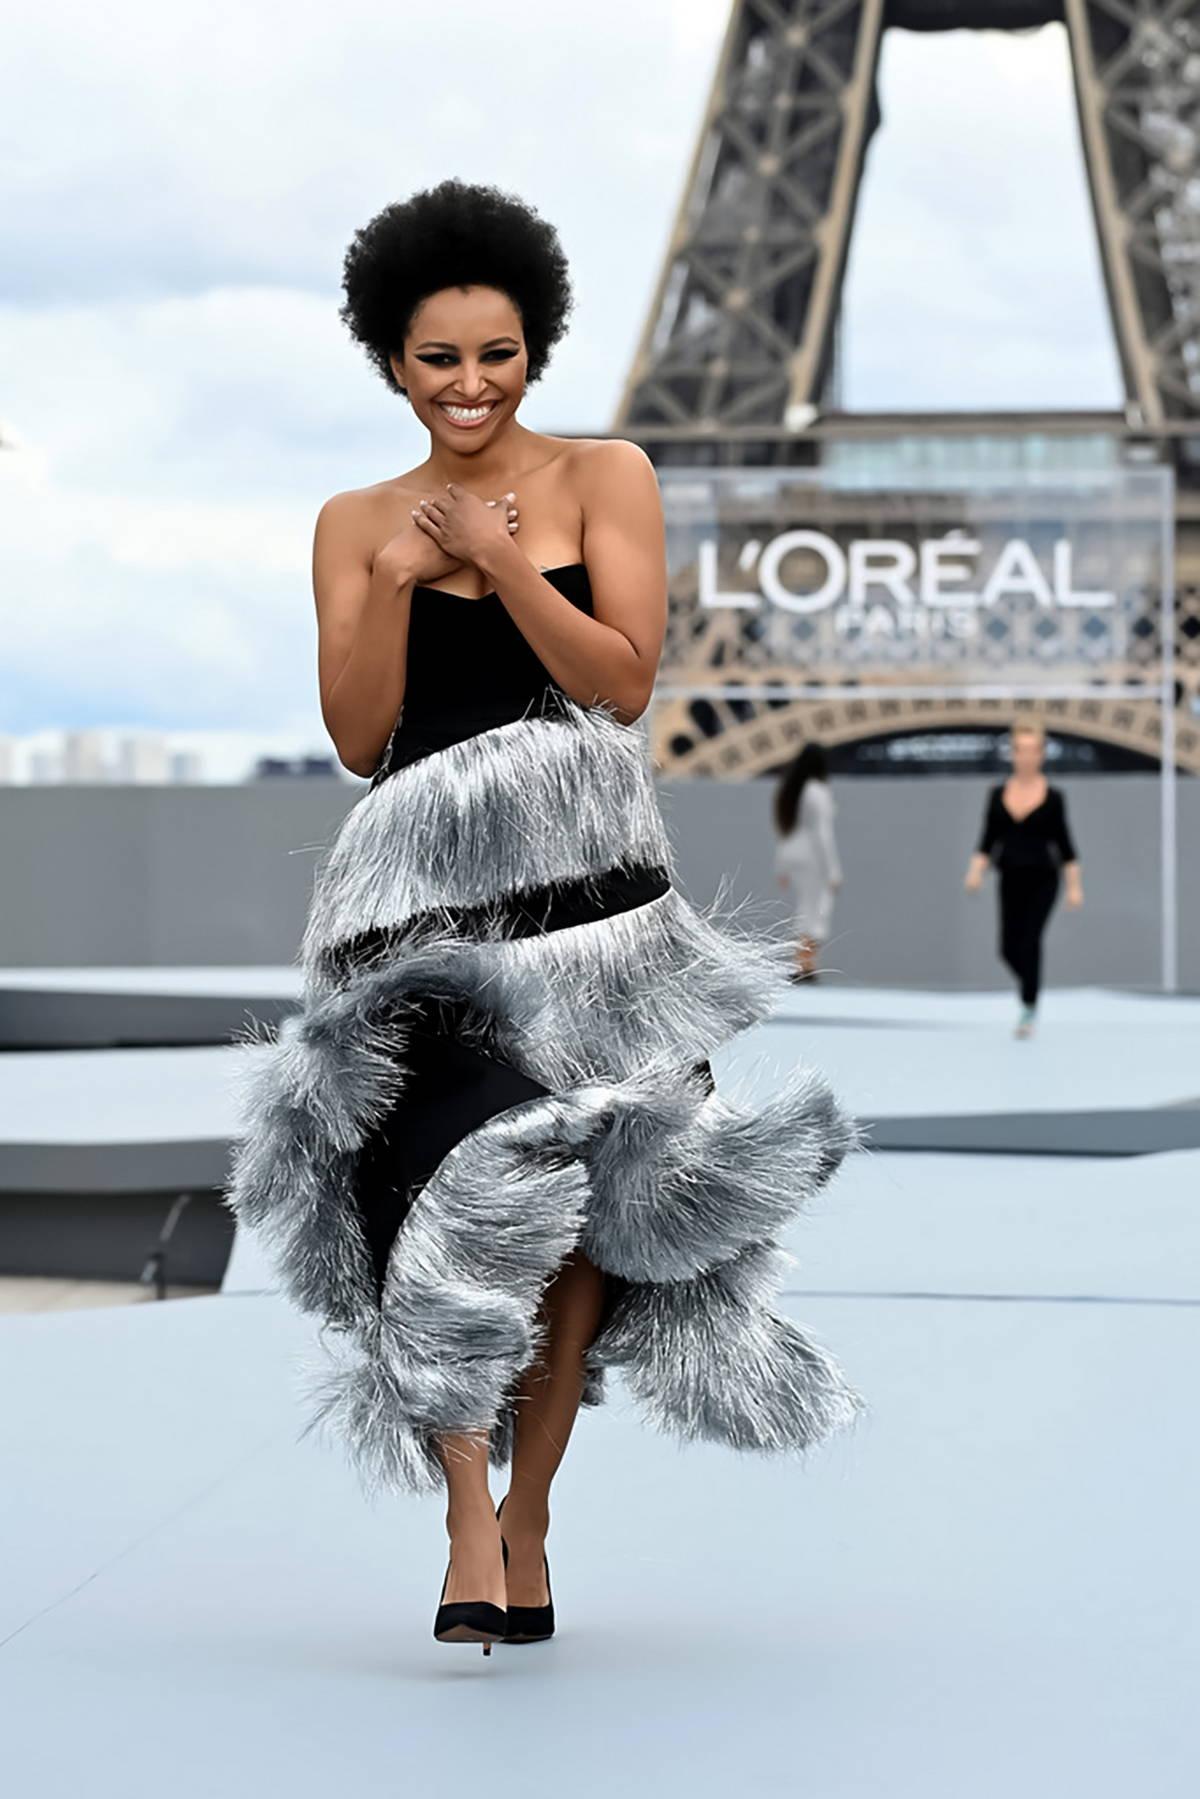 kat graham walks the runway for the le defile l'oreal paris 2021 show during paris fashion week in paris, france-031021_4